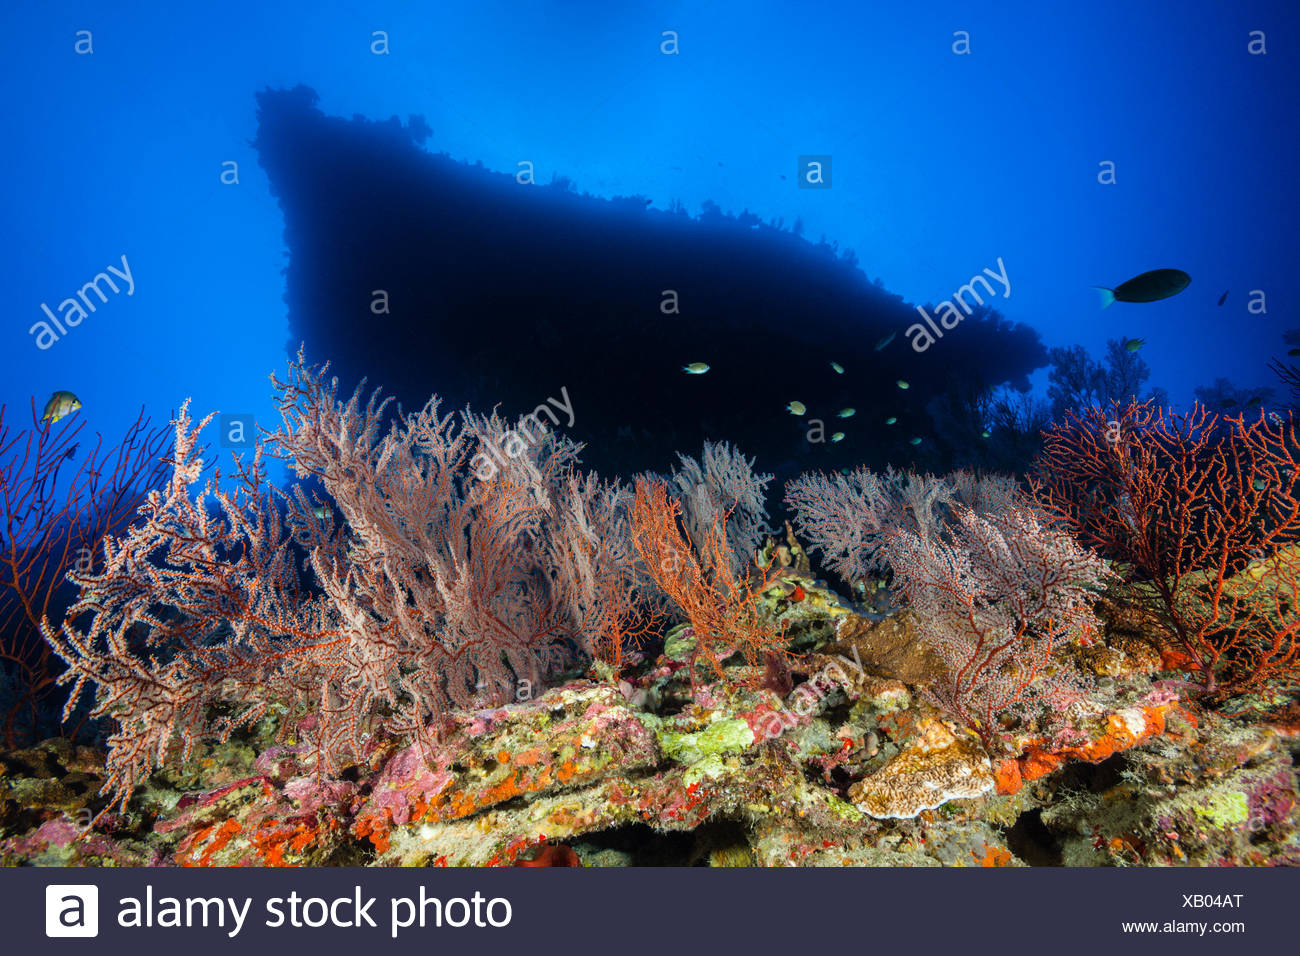 Coral Reef of Sea Fan, Gorgonaria, Christmas Island, Australia Stock Photo